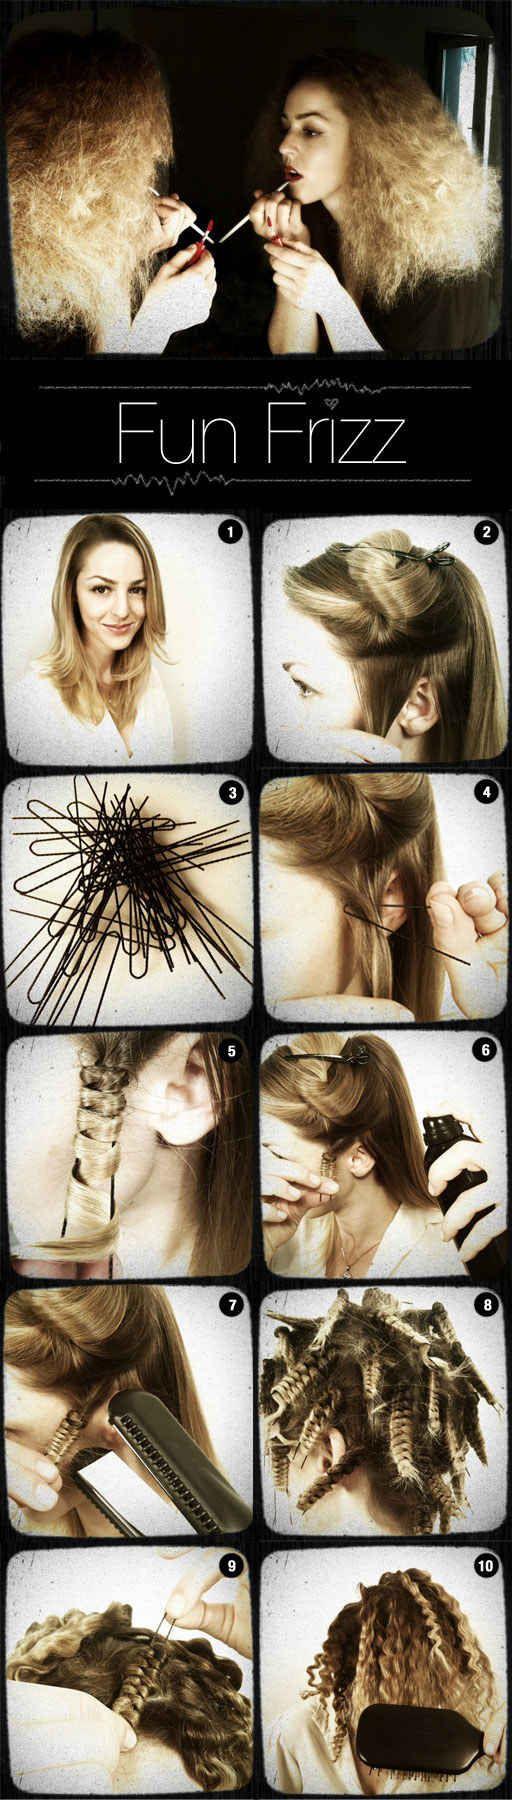 Harry Potter Alert! This Bellatrix Lestrange hair makes frizz look good.